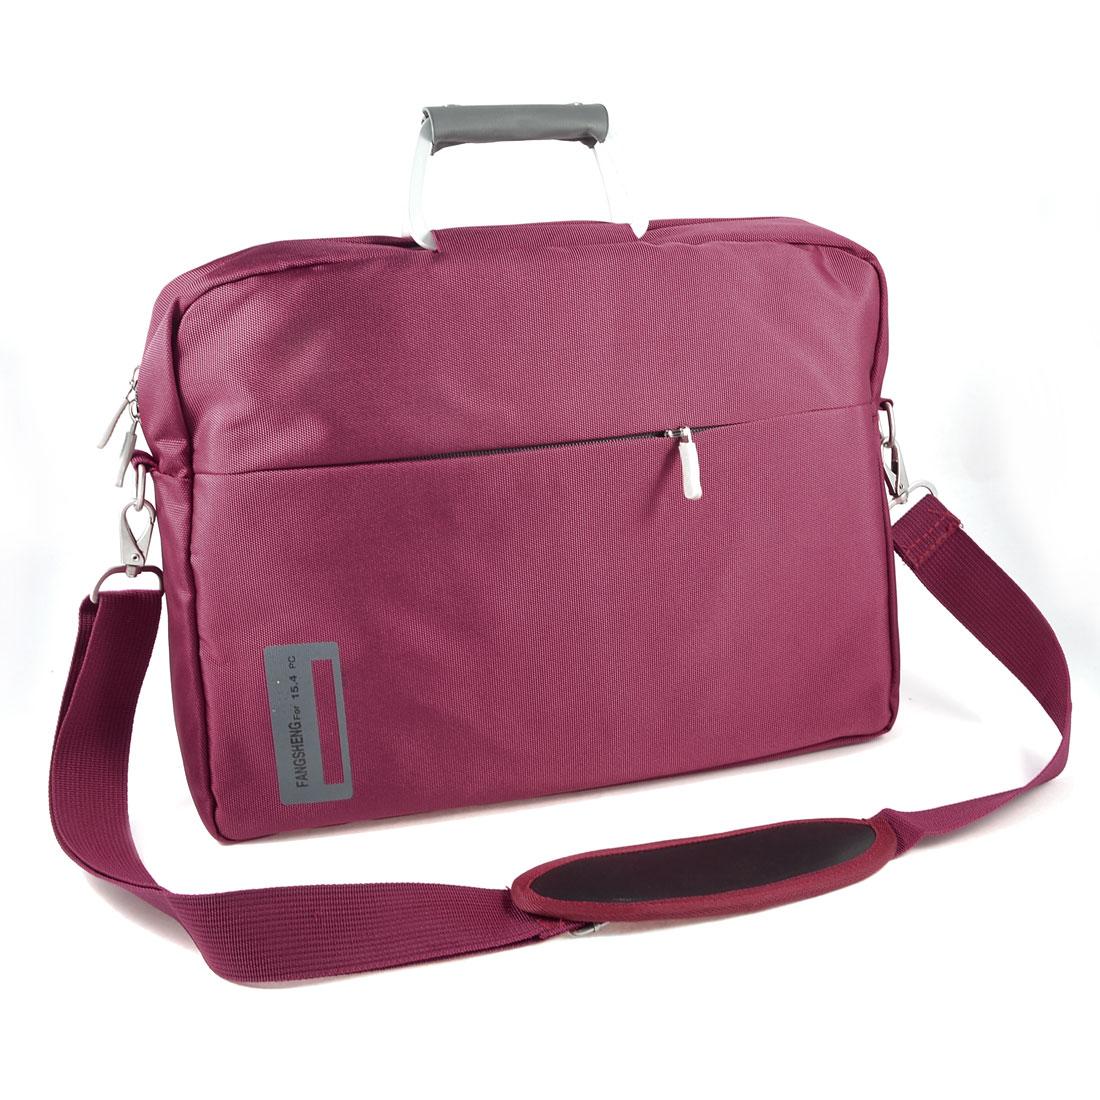 "14"" 14.1"" 14.4"" Burgundy Zip Up 3 Layers Canvas Shoulder Sleeve Laptop Bag for HP Lenovo"